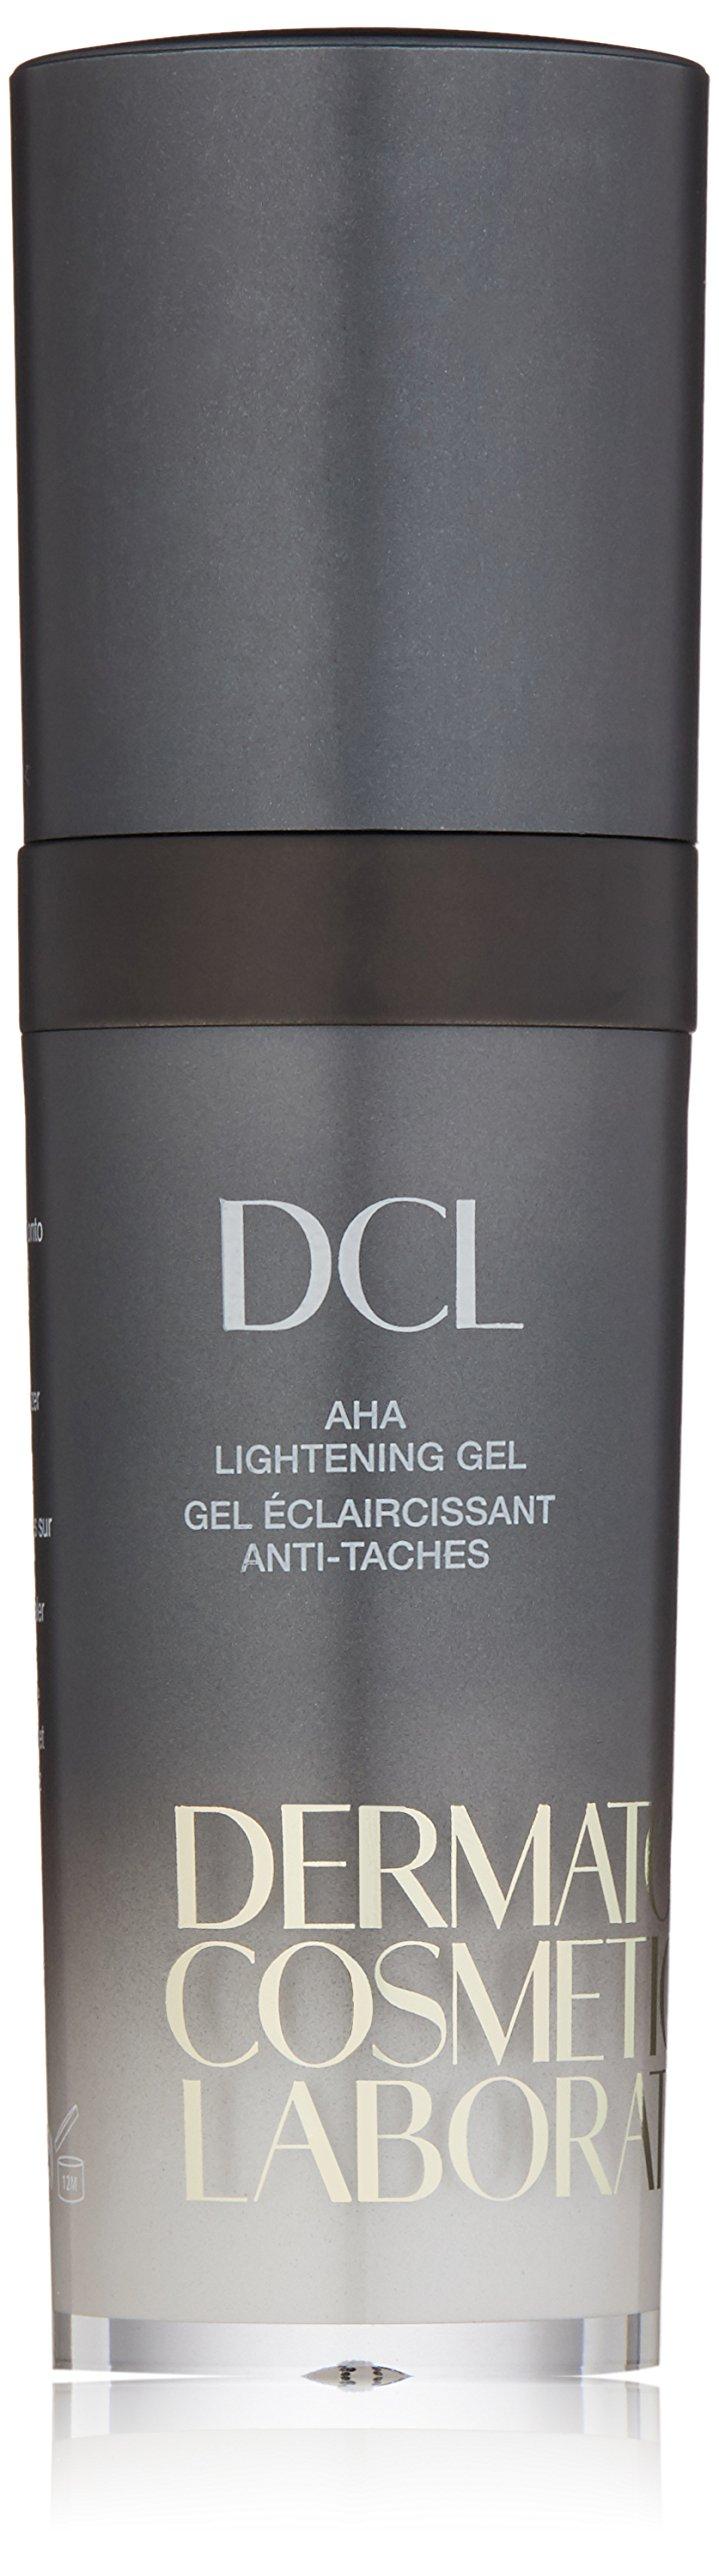 Dermatologic Cosmetic Laboratories AHA Lightening Gel, 1 fl. oz.